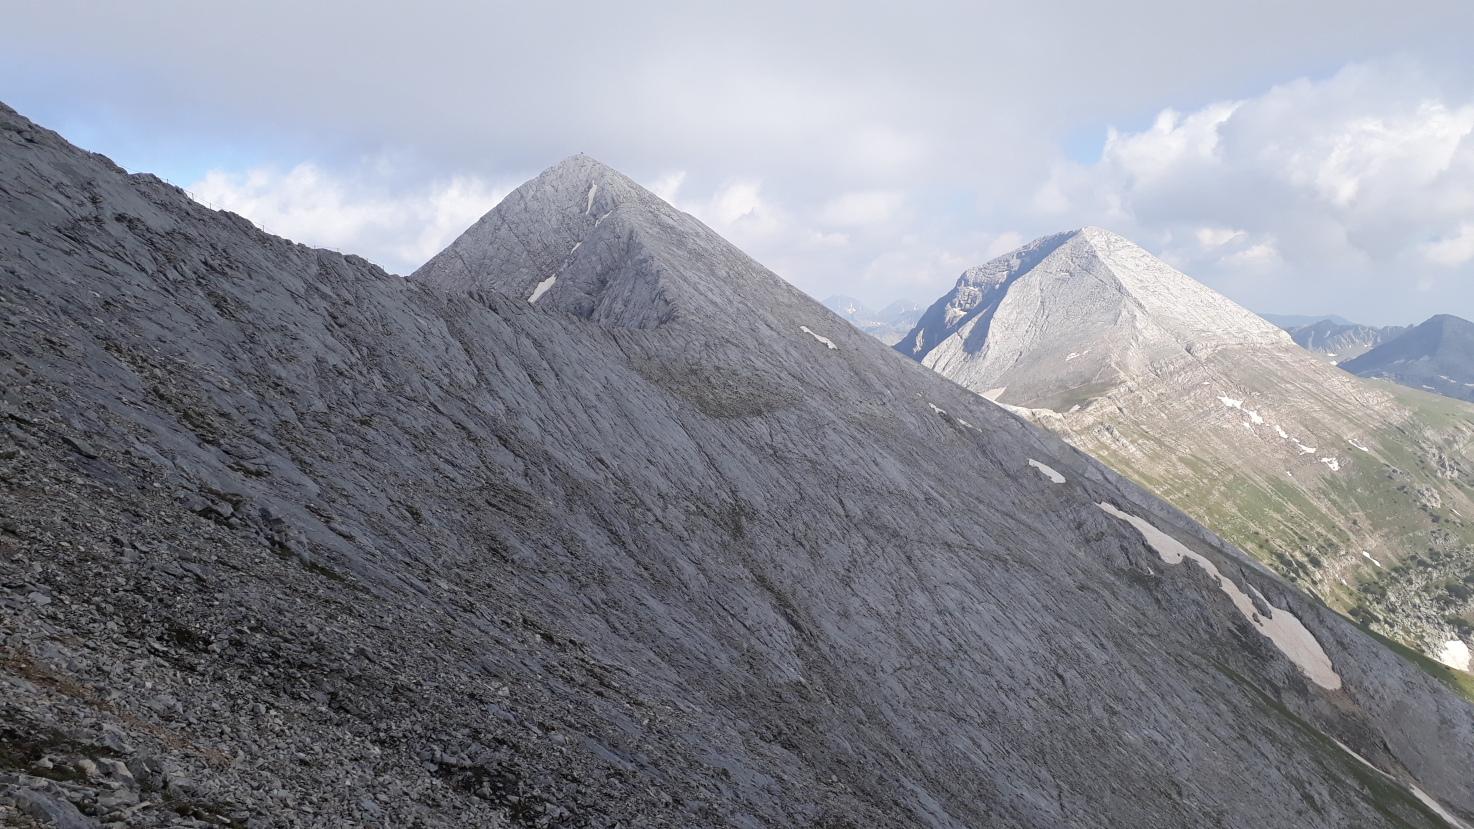 The marble ridge and Vihren peak